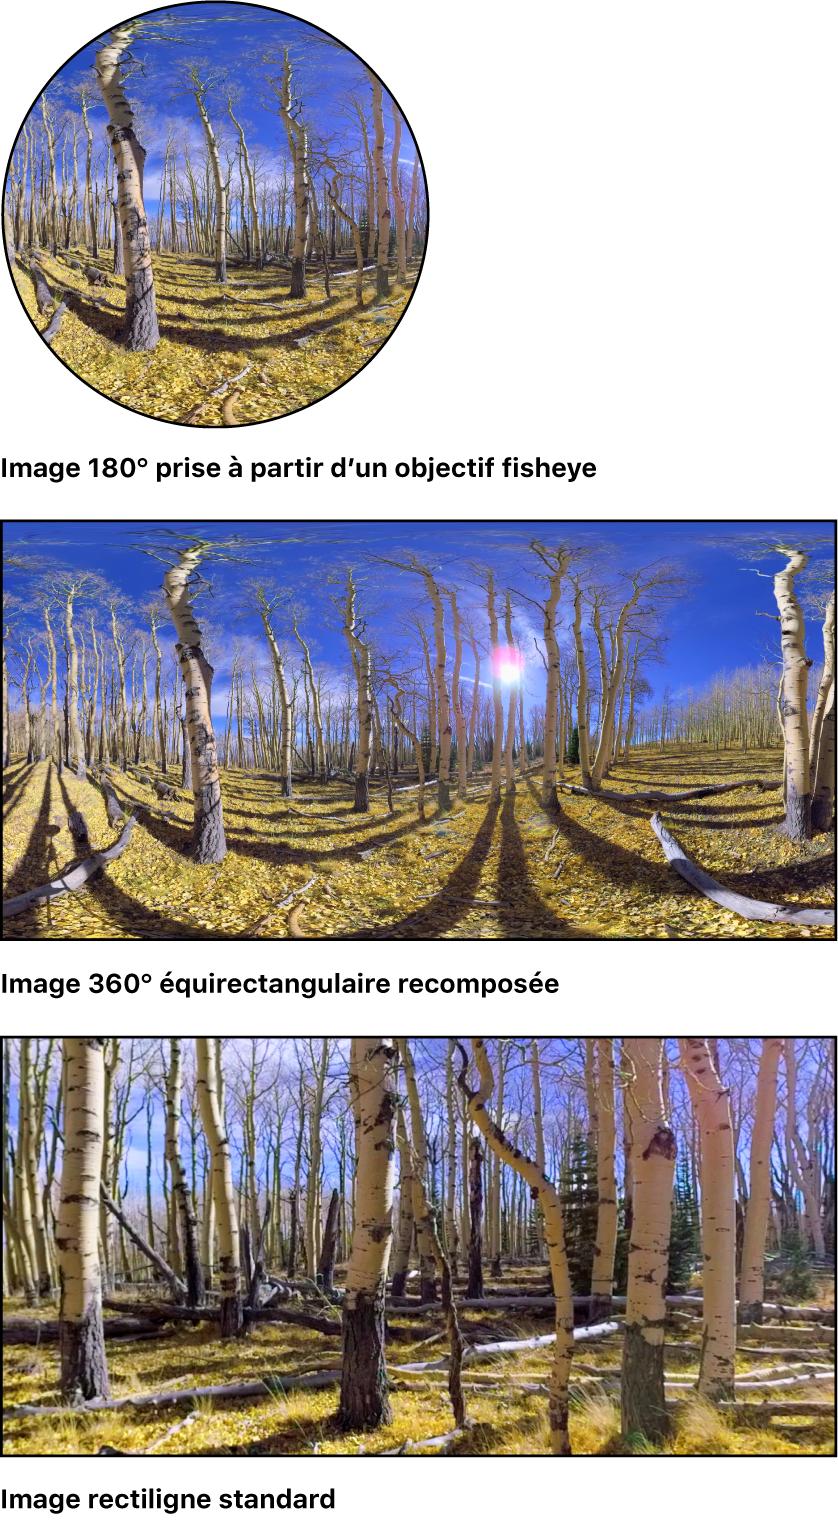 Image fisheye simple, image 360° assemblée et image rectiligne standard